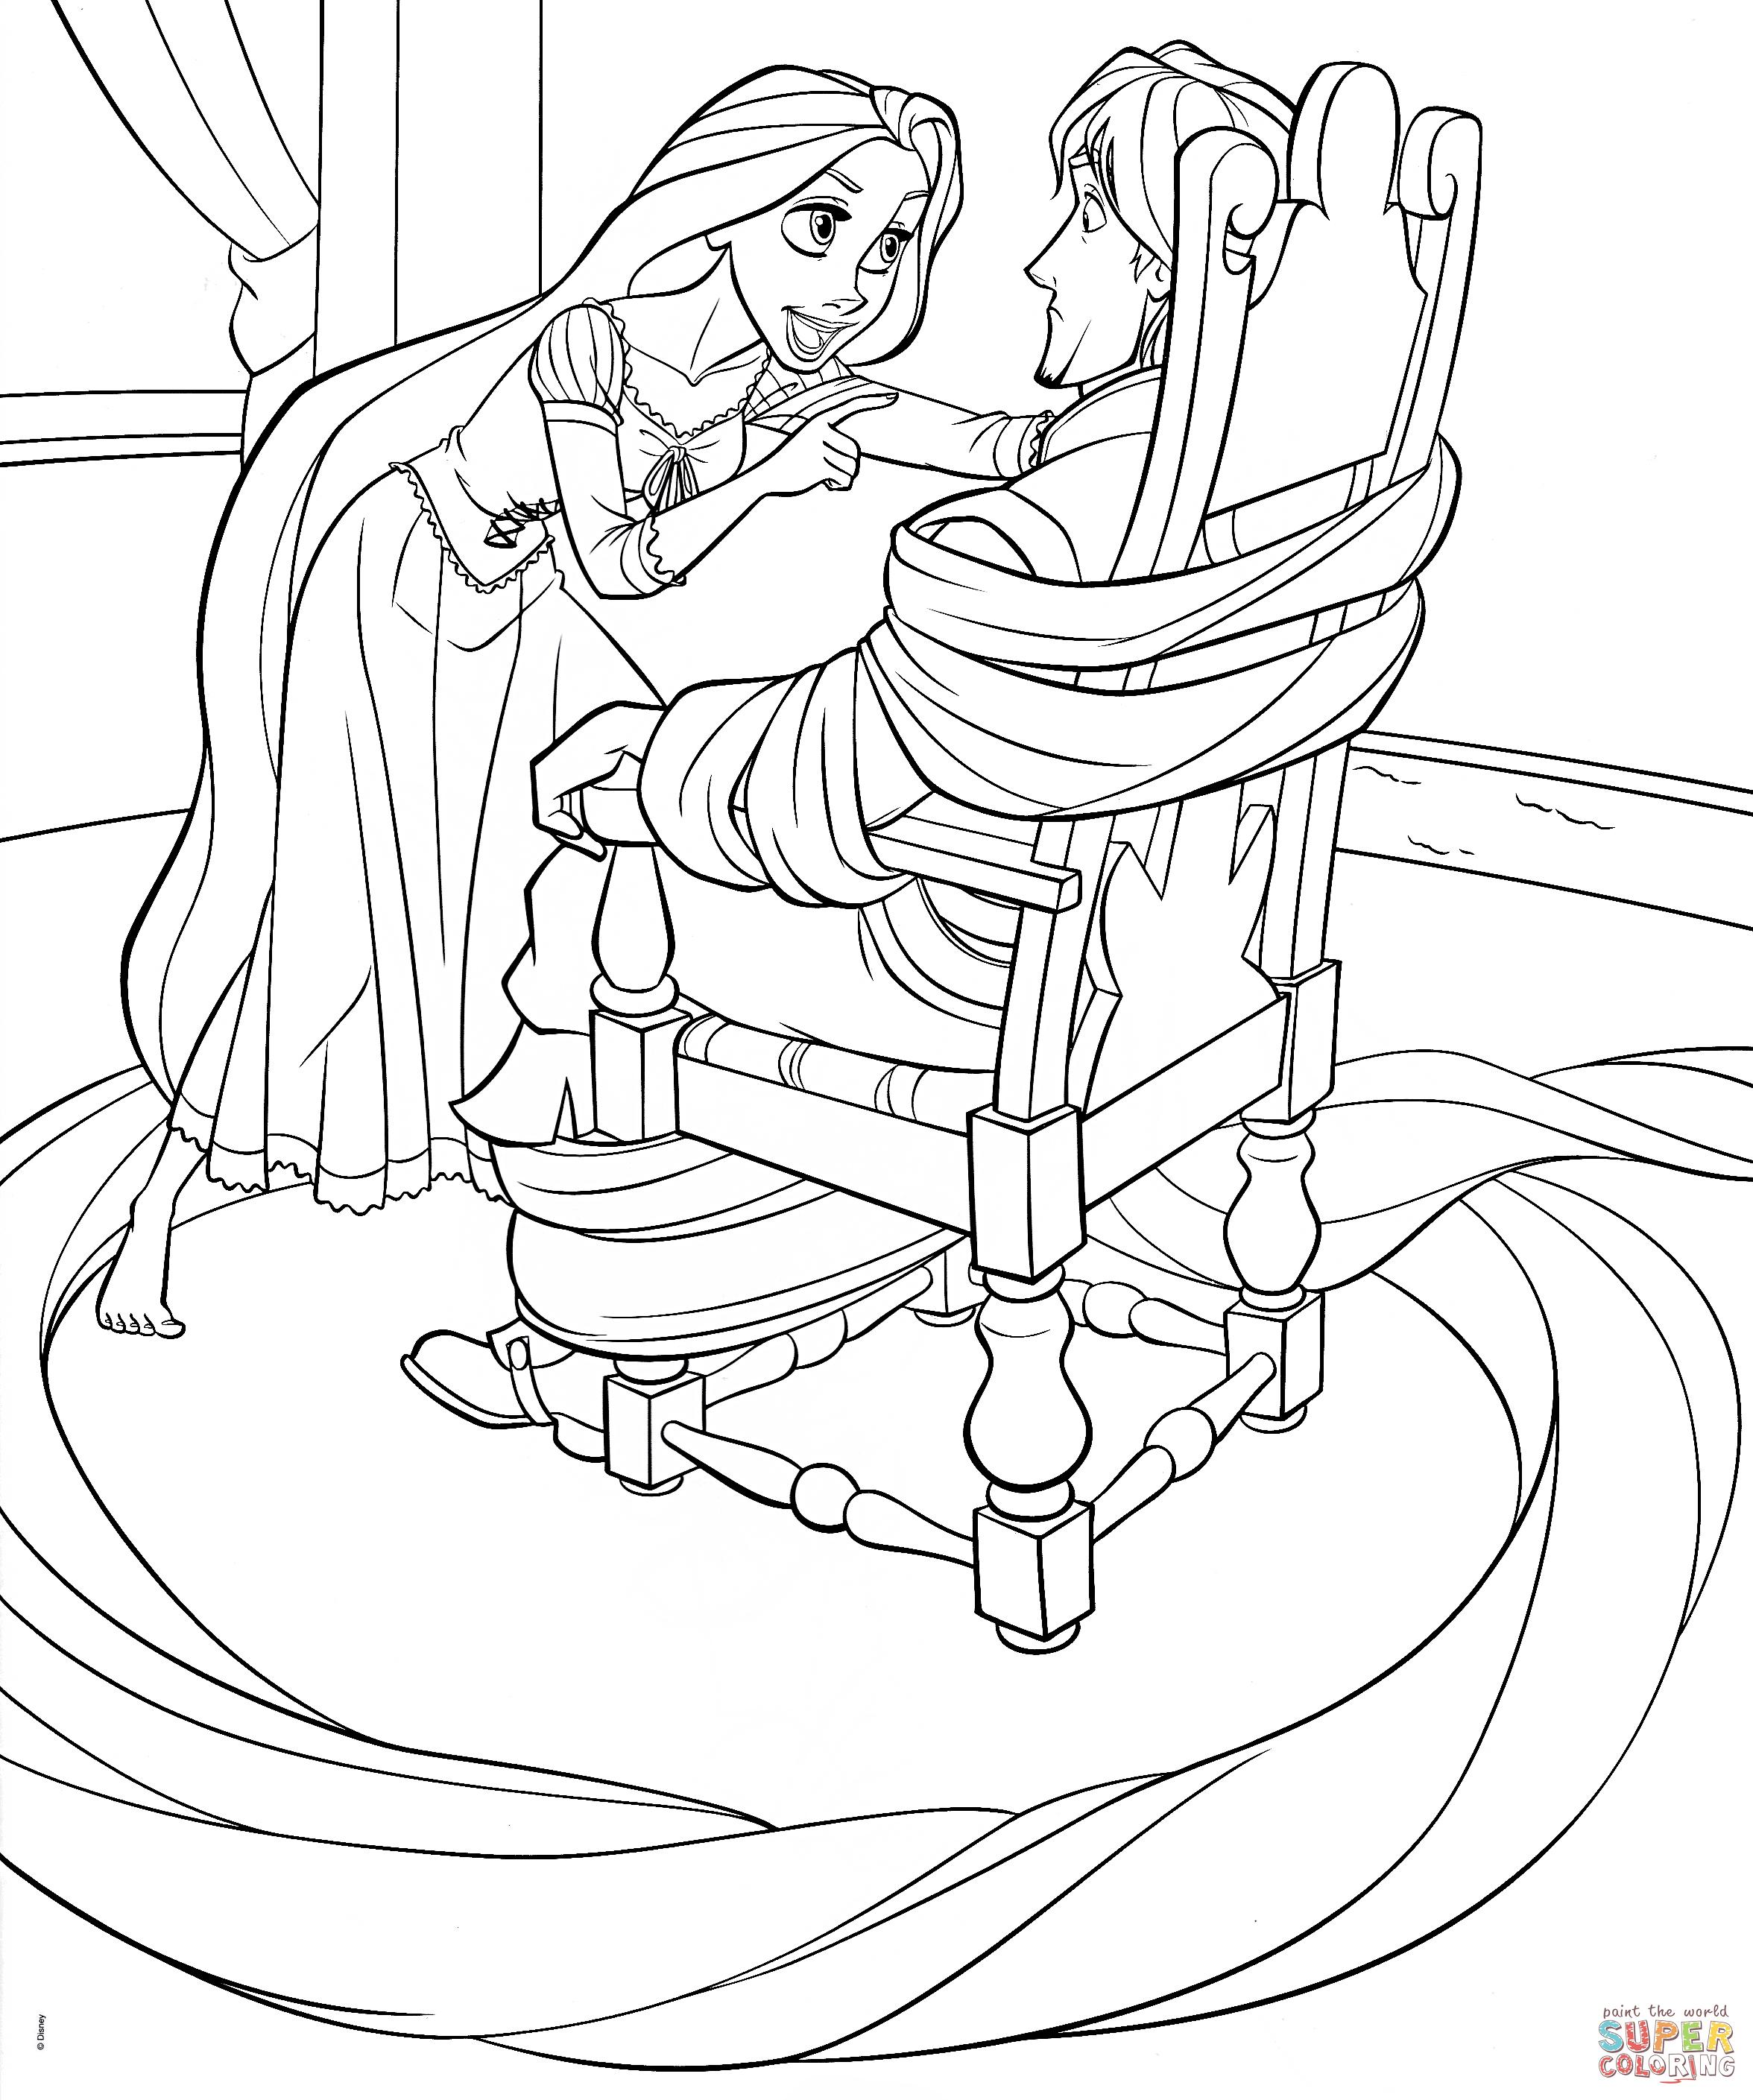 Coloriage ° | Disney princess coloring pages, Princess ...